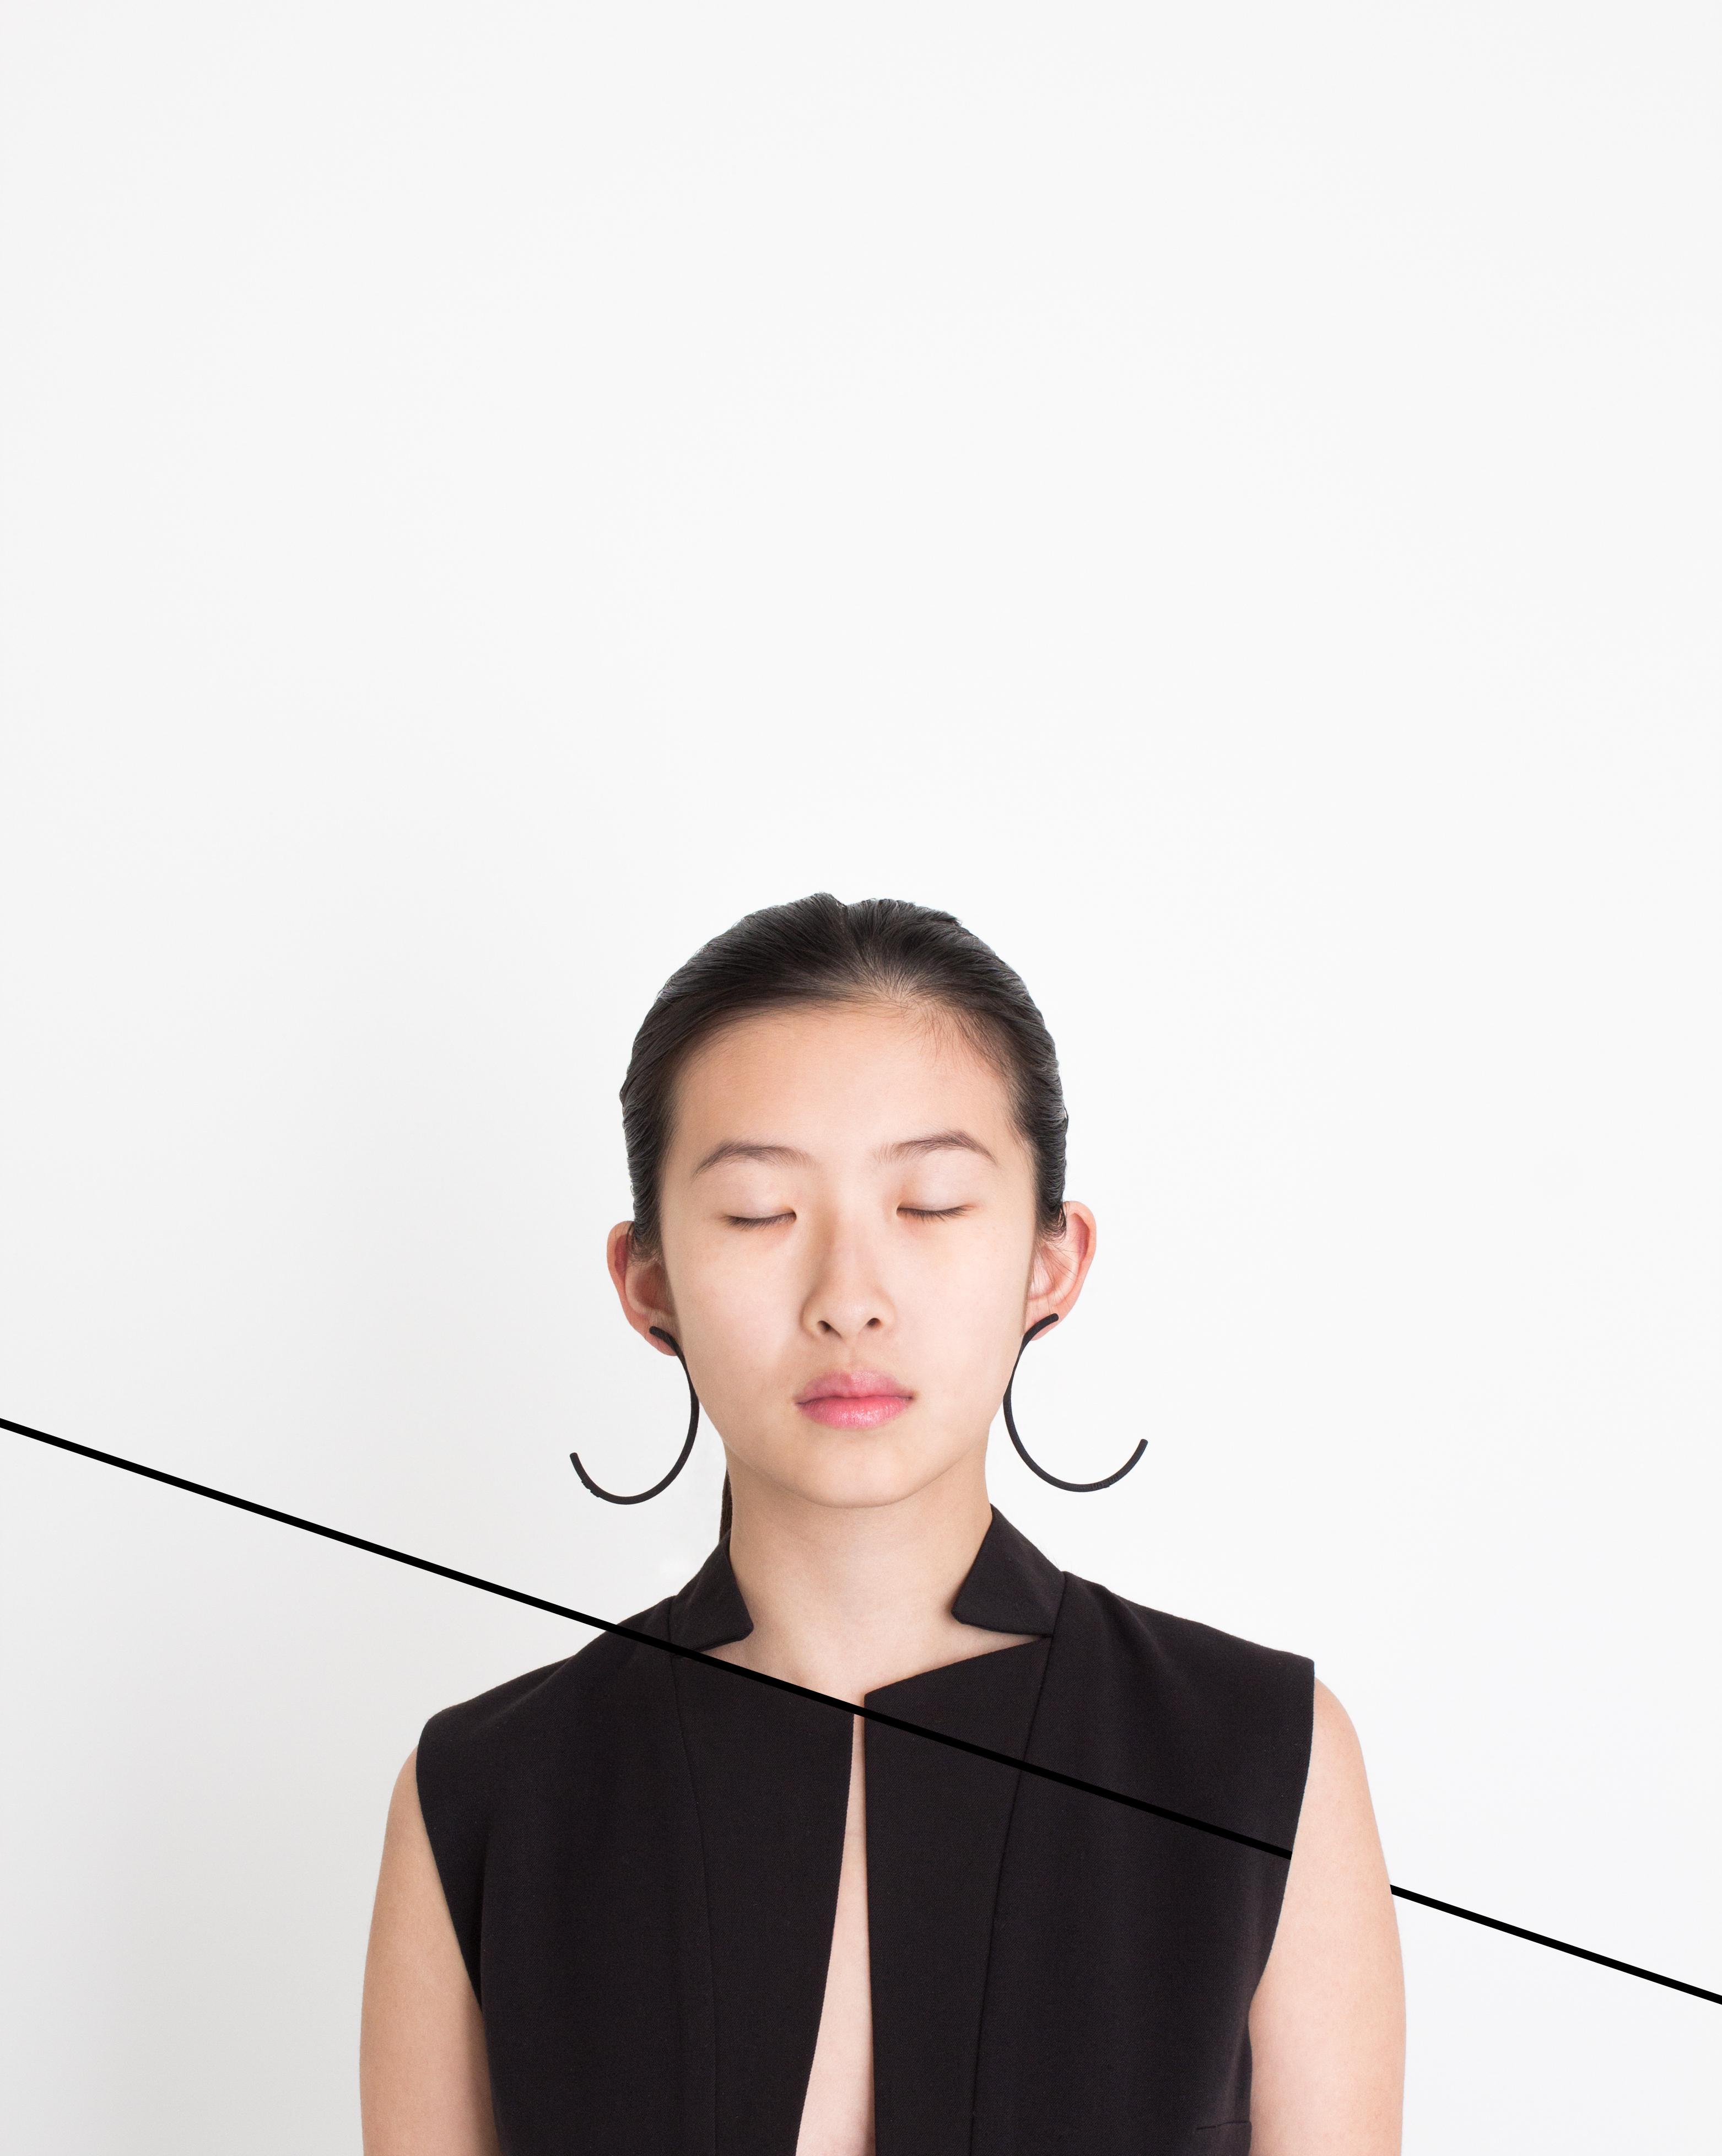 MQVFW19 un_wearable by guezin © @jonaeichhorn